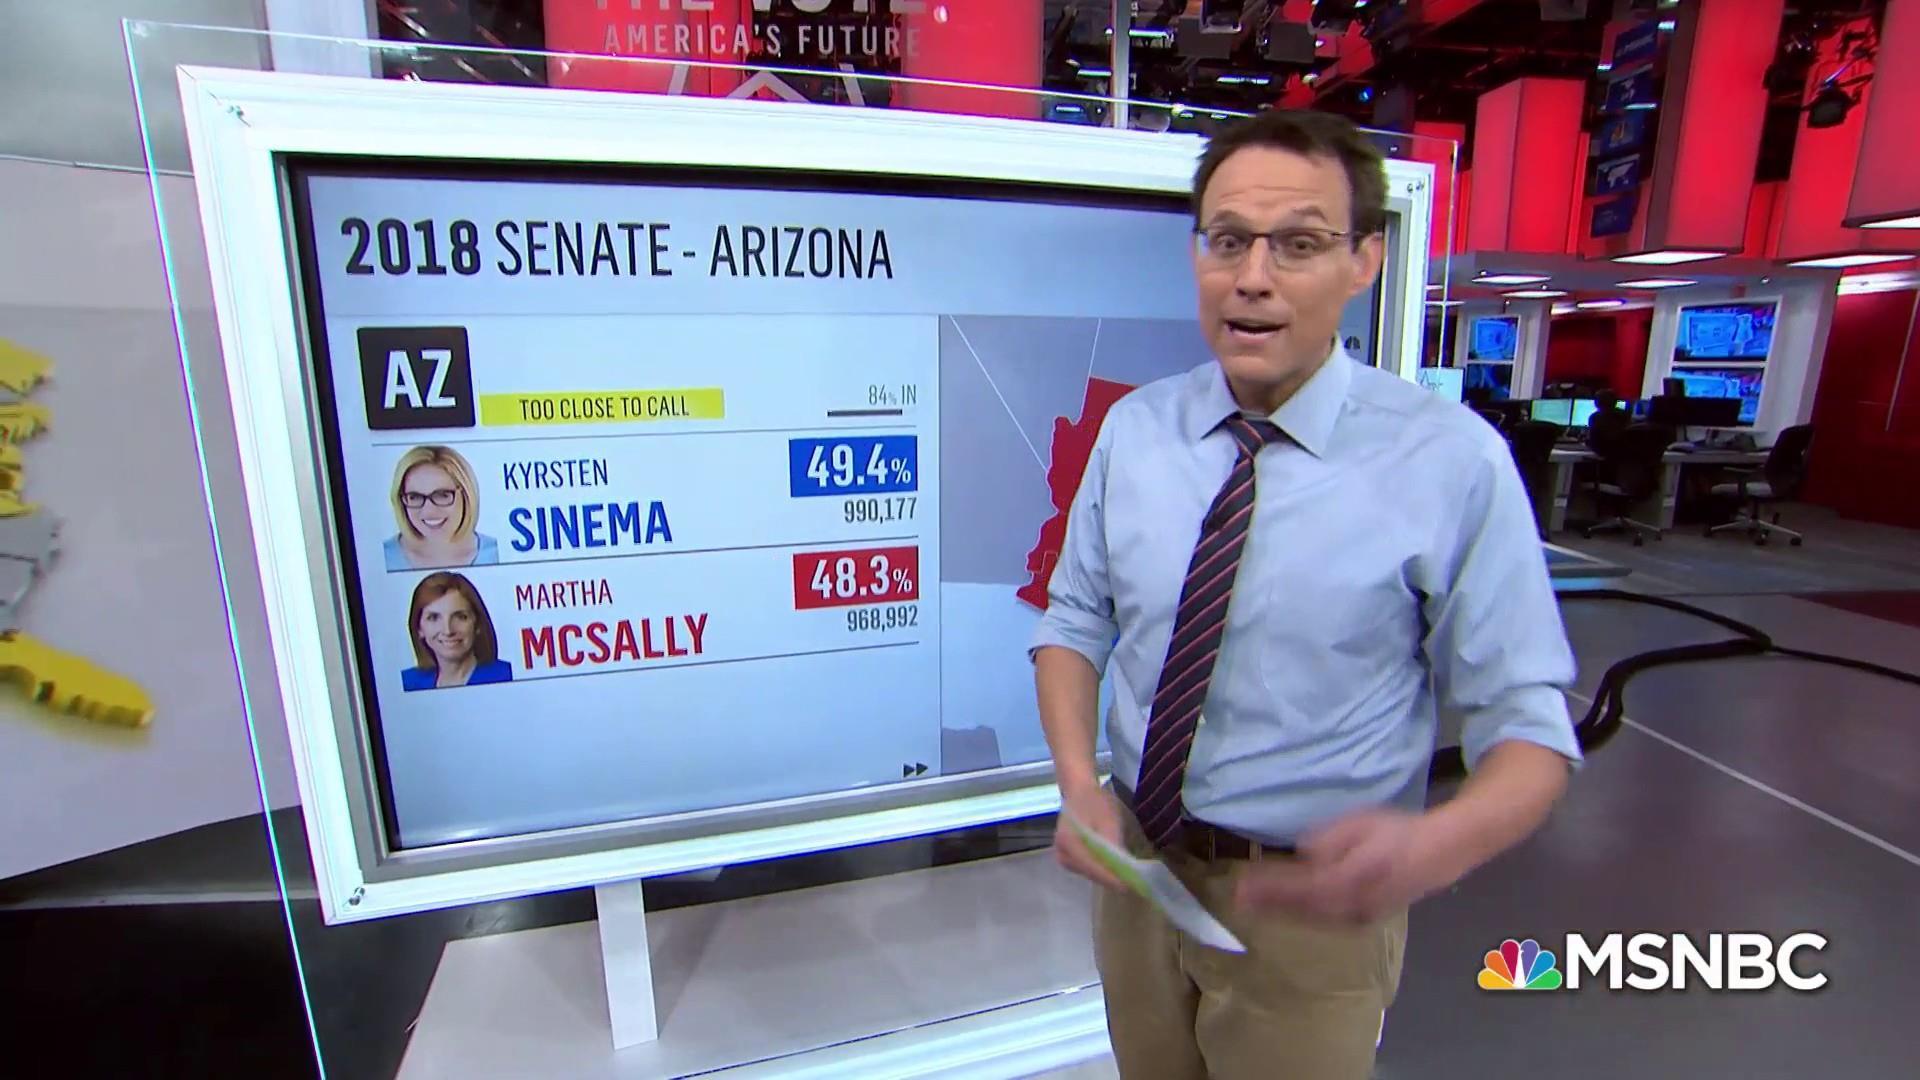 Sinema lead expands to 22k in Arizona Senate race